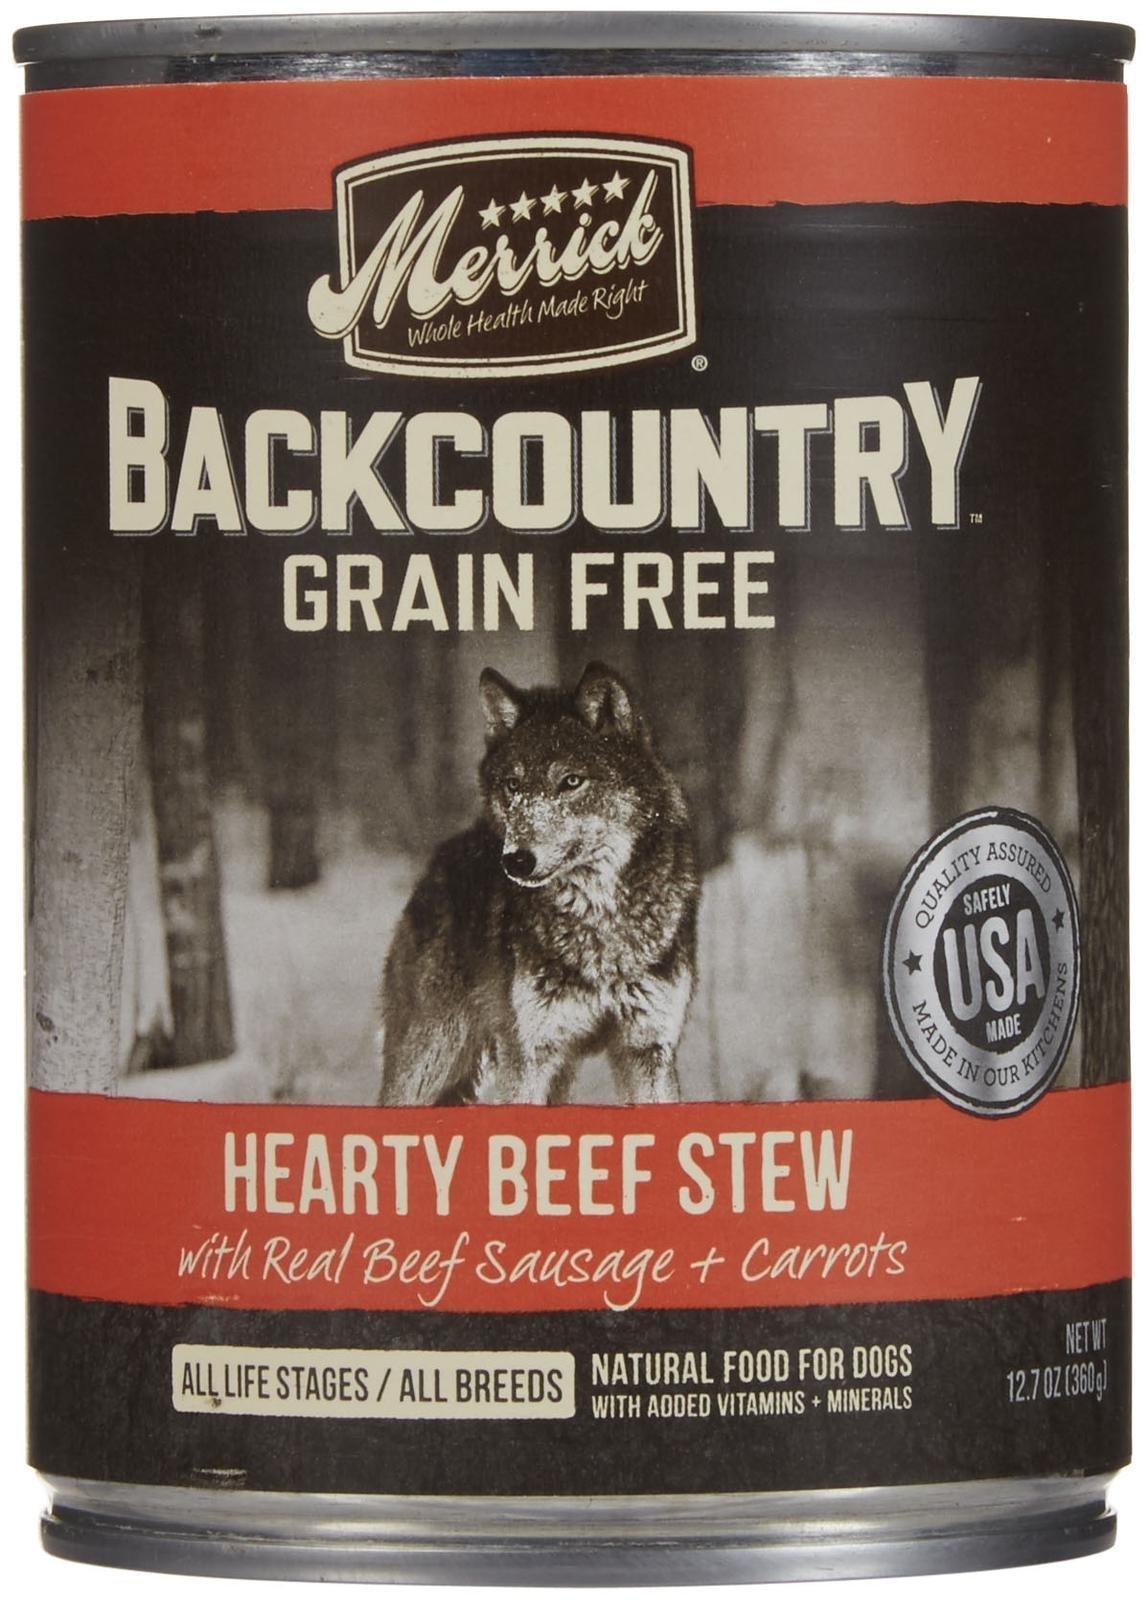 Merrick Backcountry - Hearty Beef Stew - 12.7 oz - 12 ct